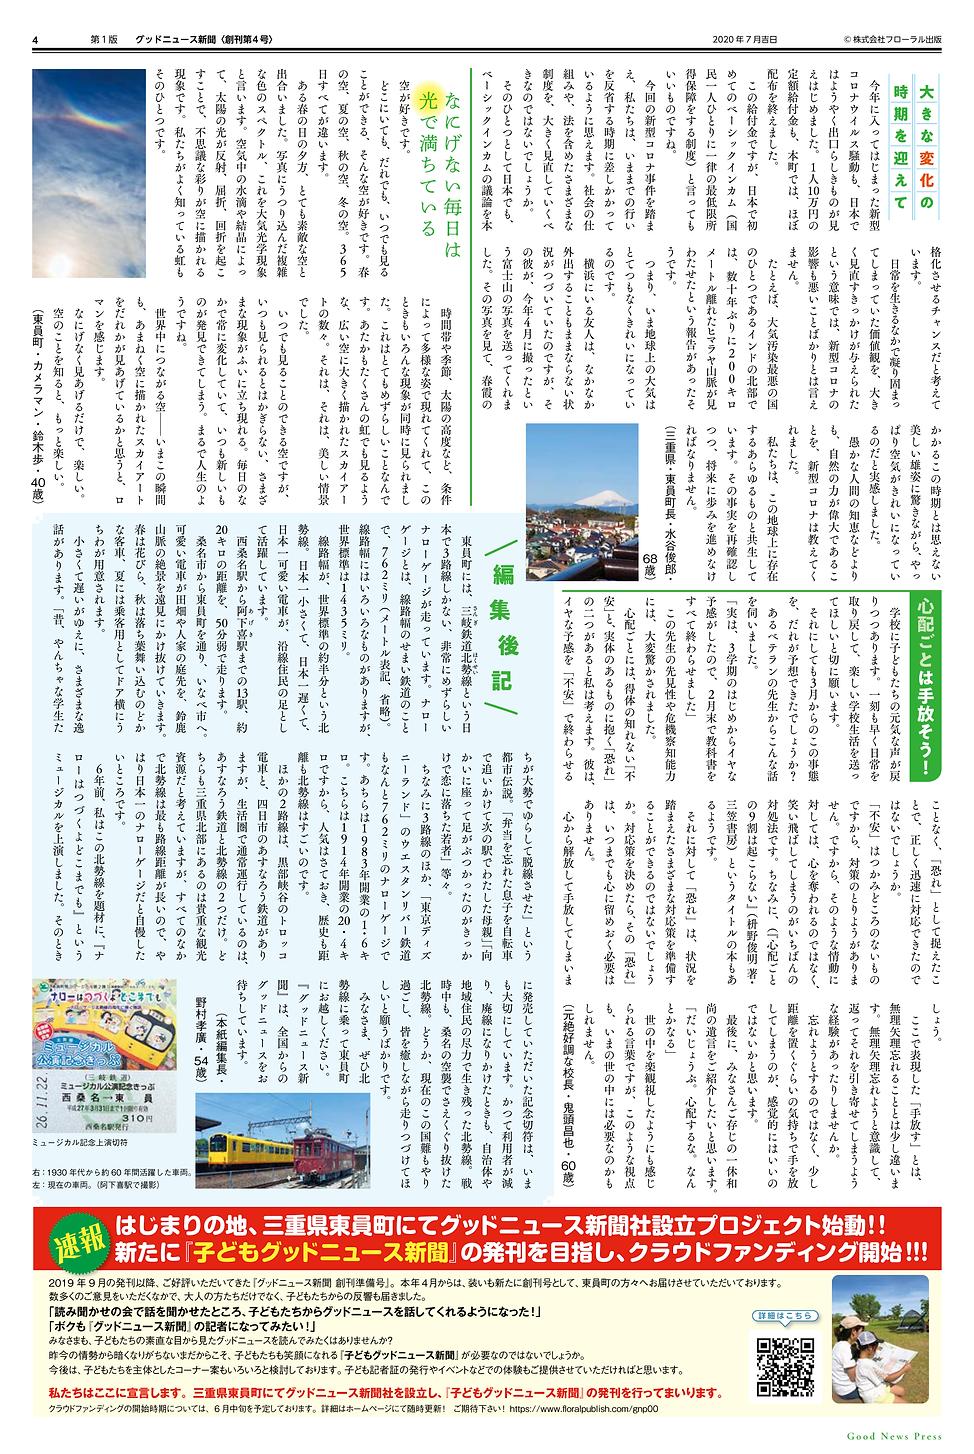 GNP4go-webyo_ページ_4.png